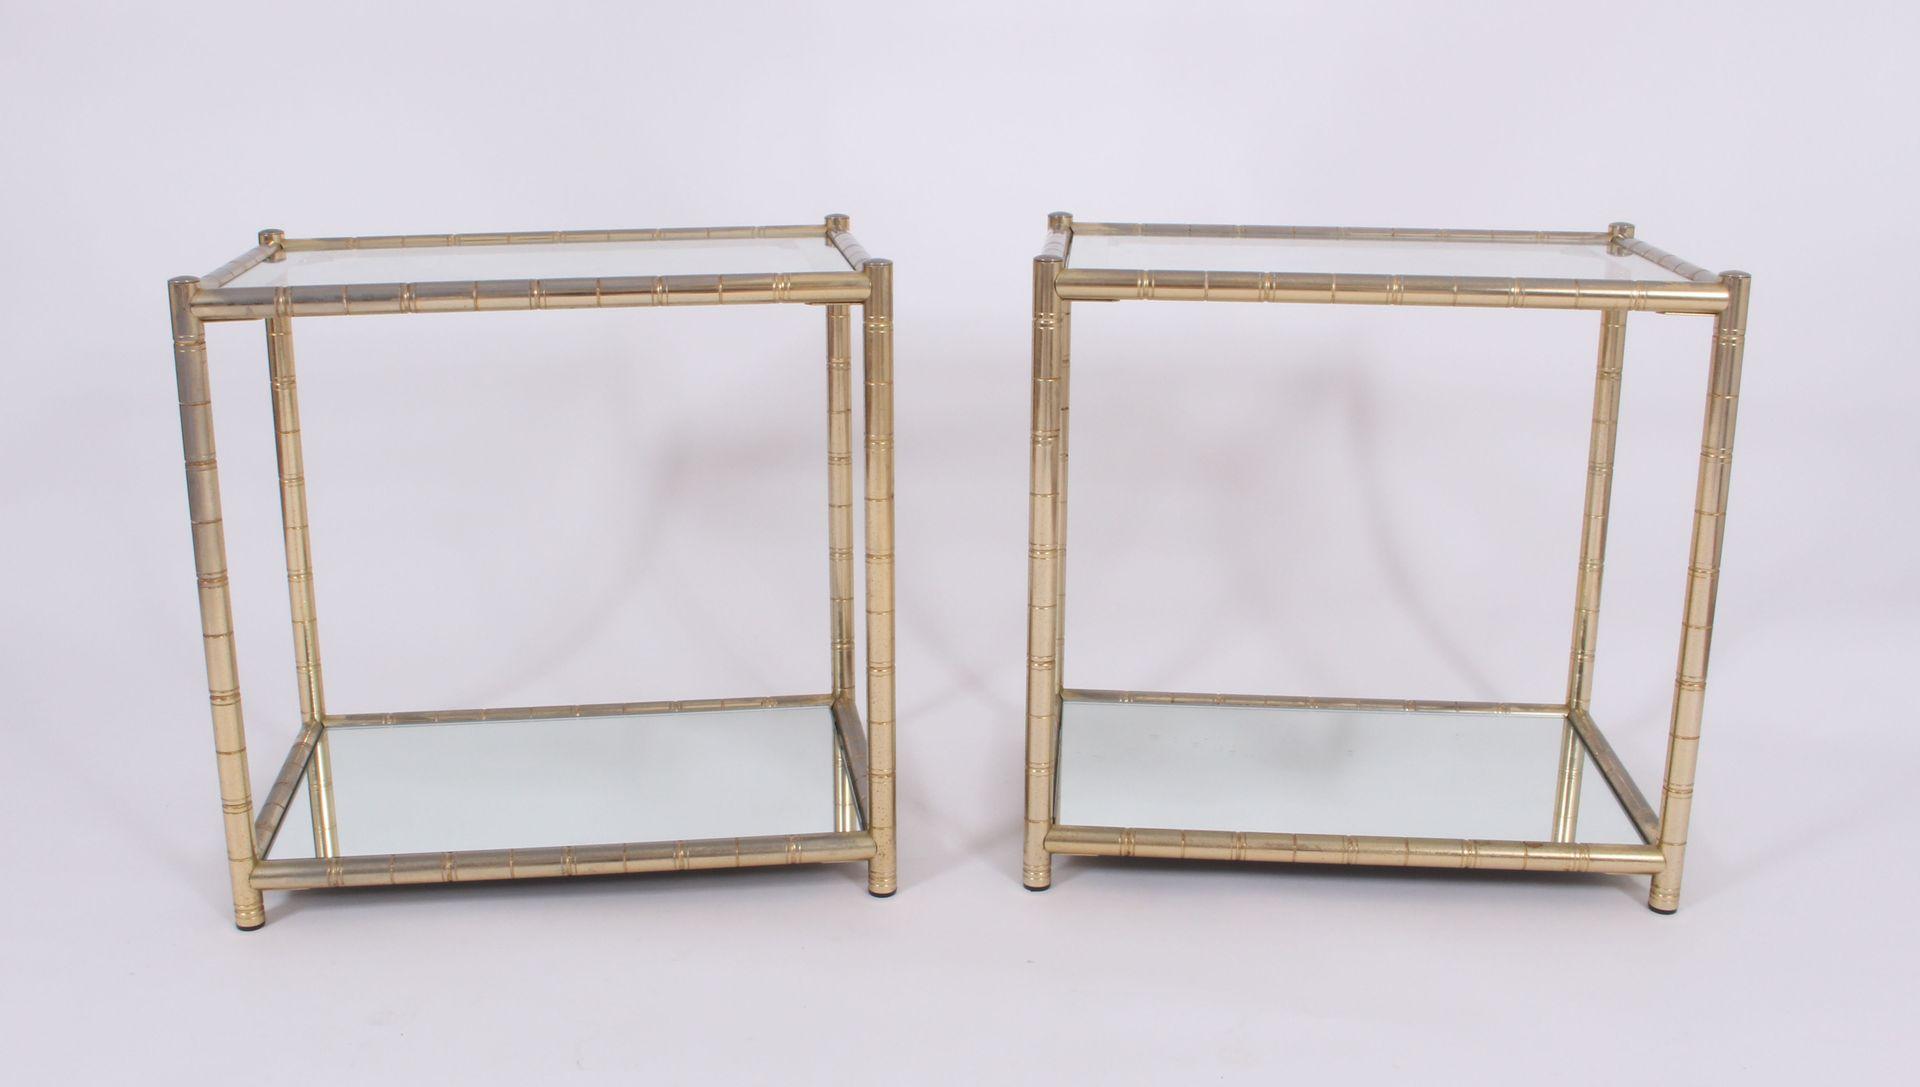 vintage beistelltische aus vergoldetem metall 2er set bei. Black Bedroom Furniture Sets. Home Design Ideas